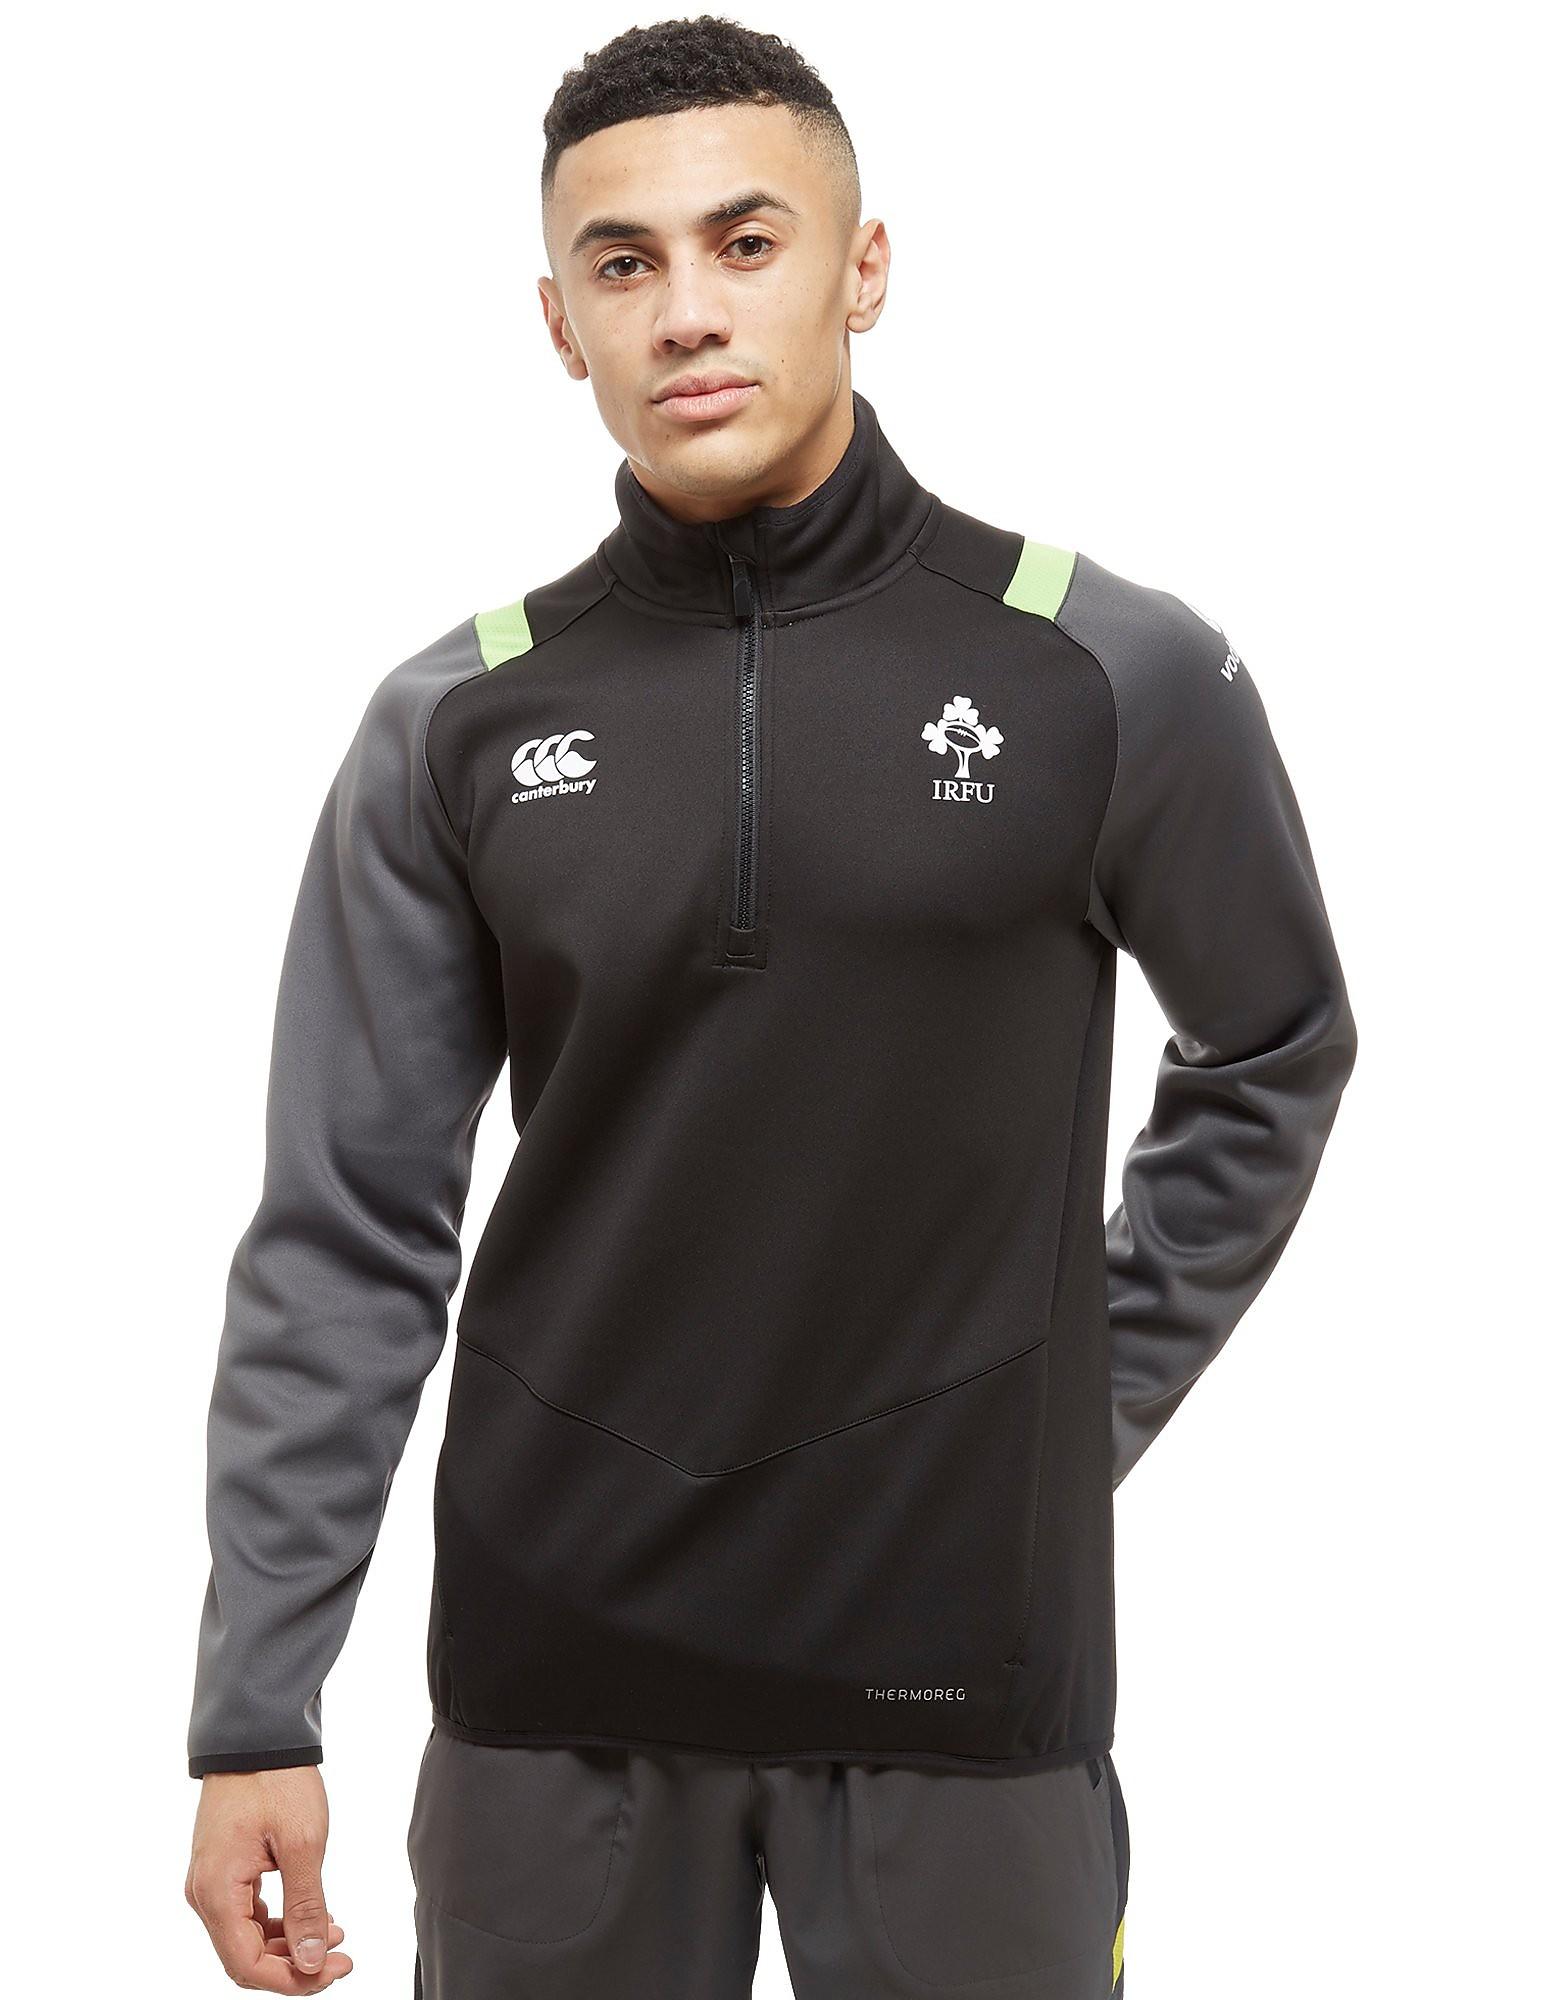 Canterbury Ireland RFU Thermal 1/2 Zip Sweatshirt